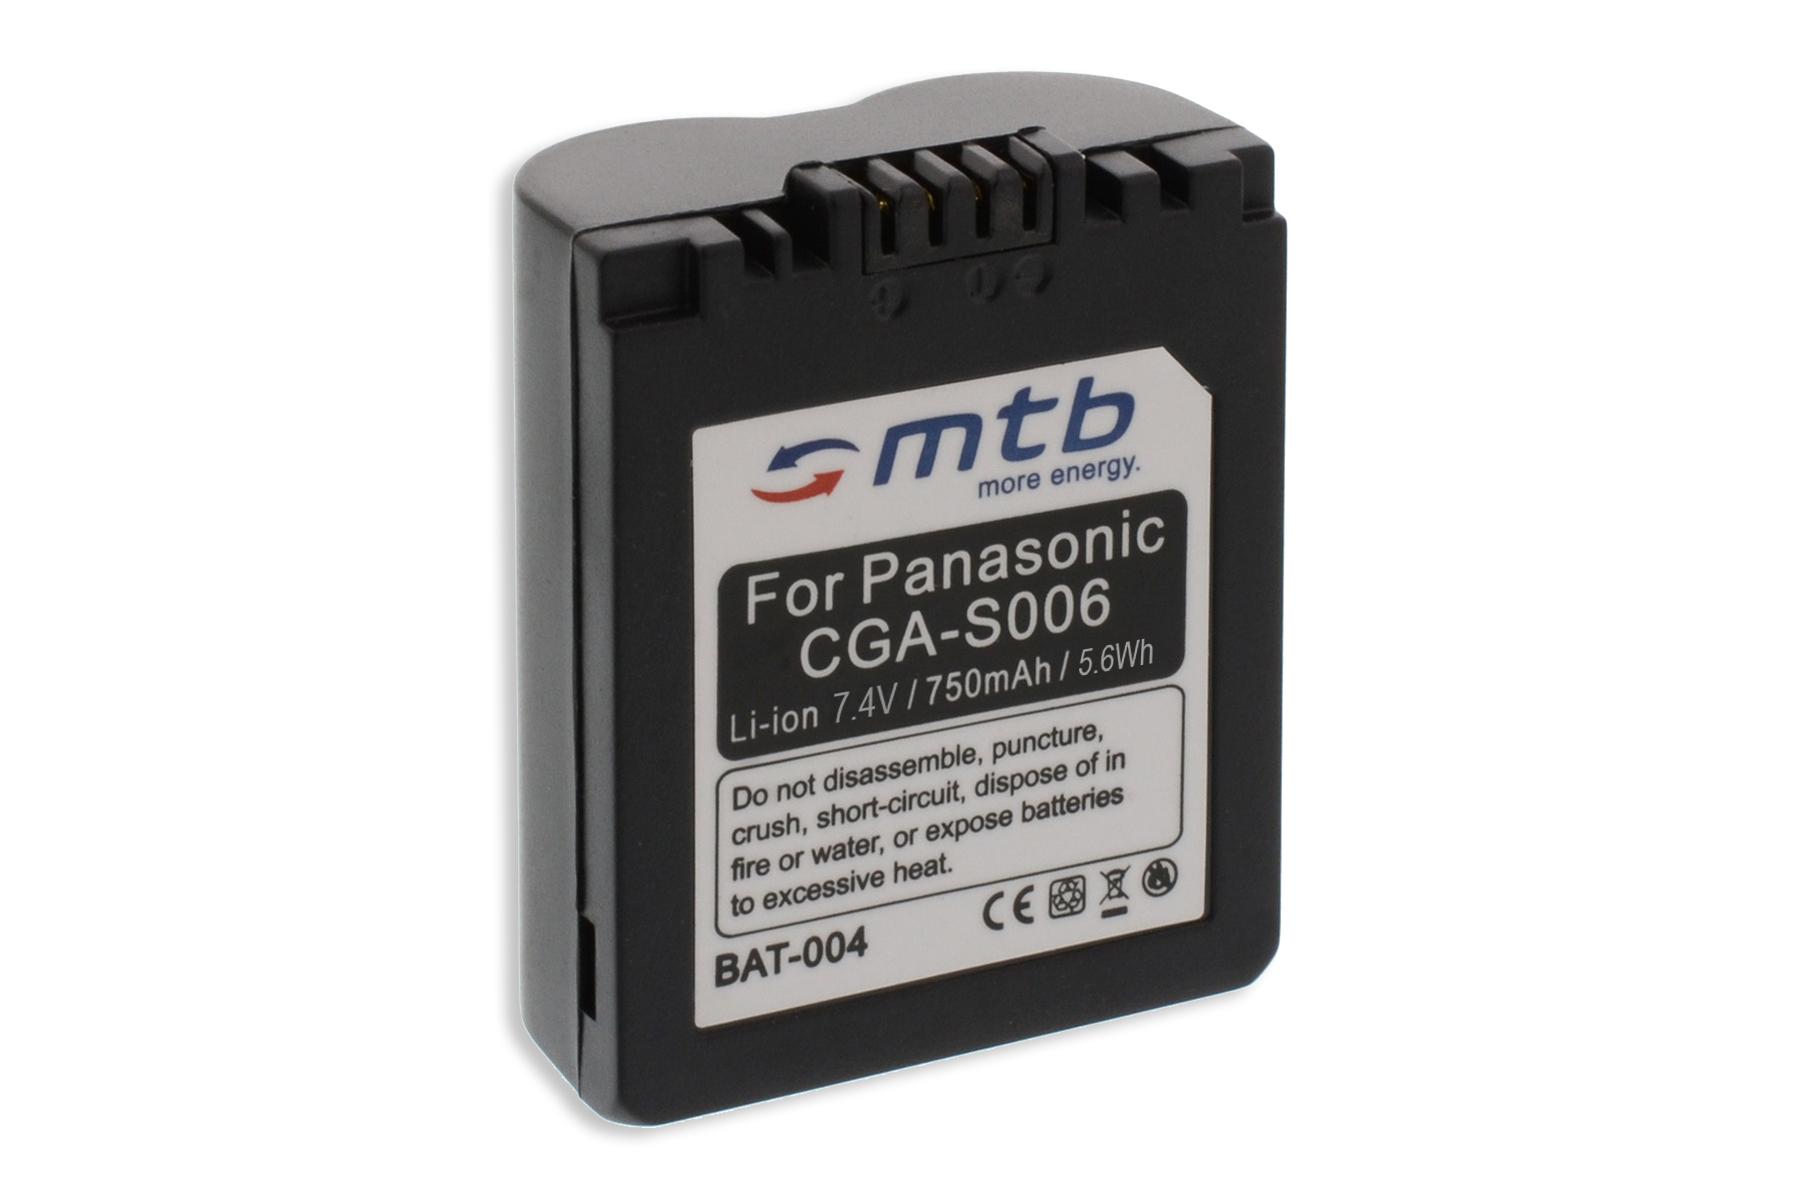 Batterie cga s006 pour panasonic lumix dmc fz7 fz8 fz18 - Batterie panasonic lumix dmc fz18 ...